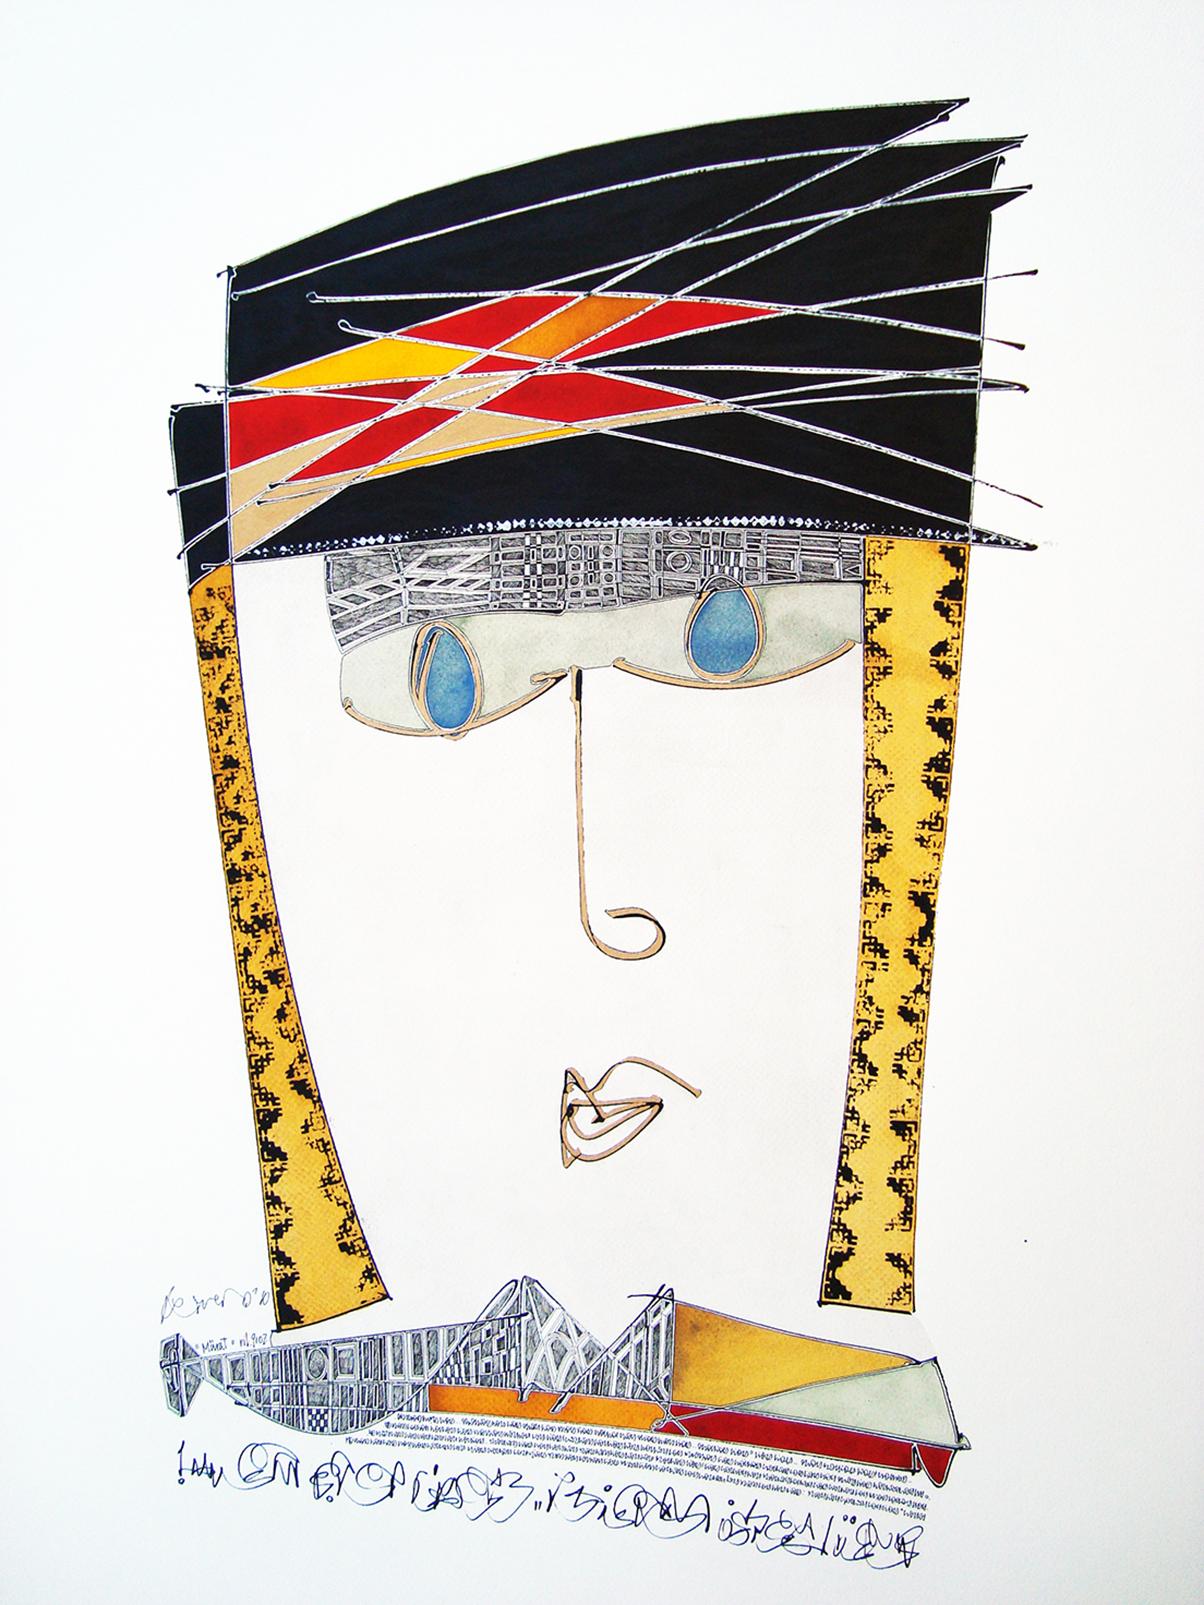 Murat artwork by Juan Carlos Norero - art listed for sale on Artplode